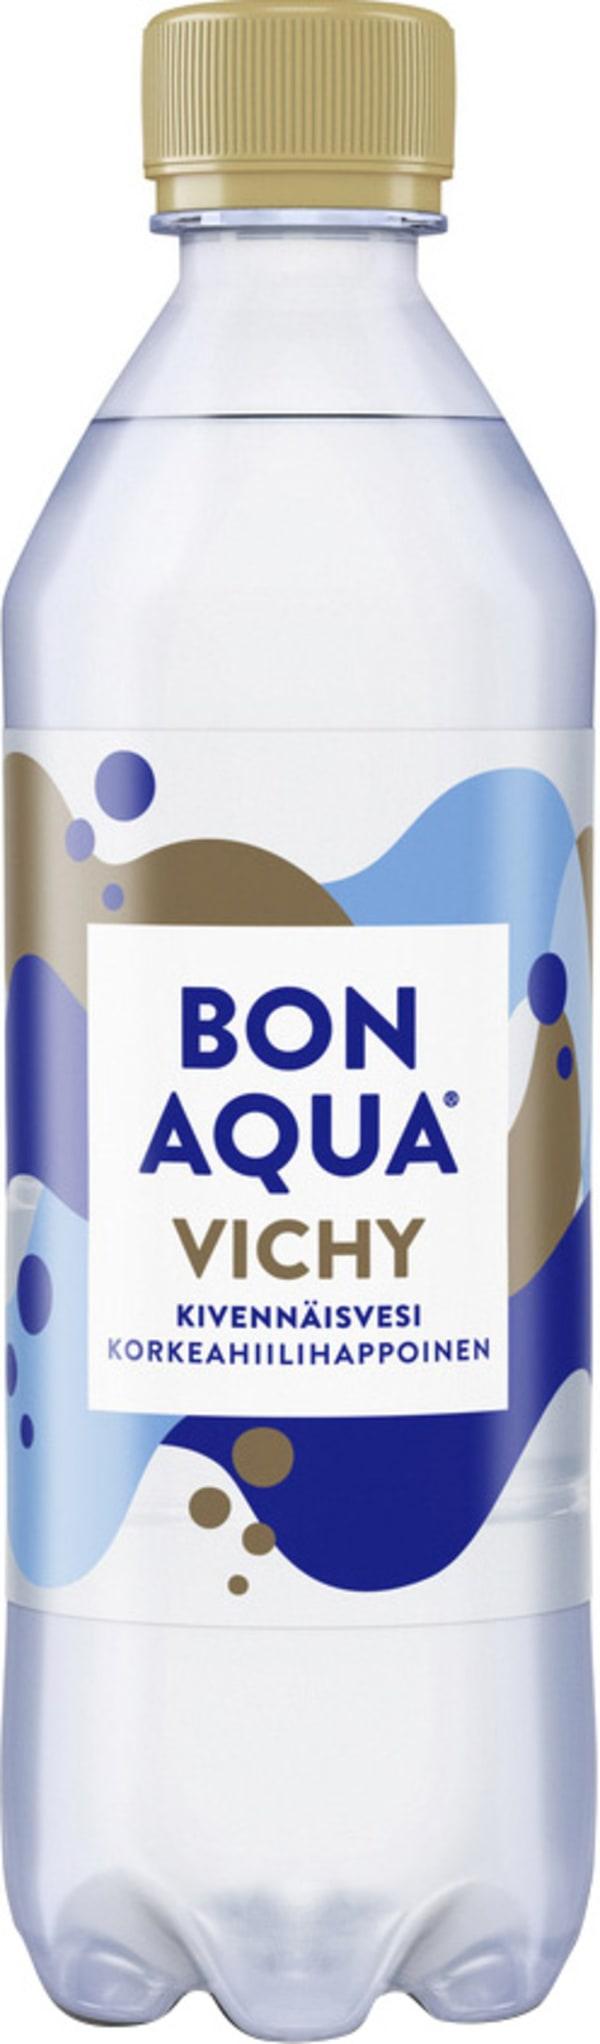 Bonaqua Vichy plastic bottle